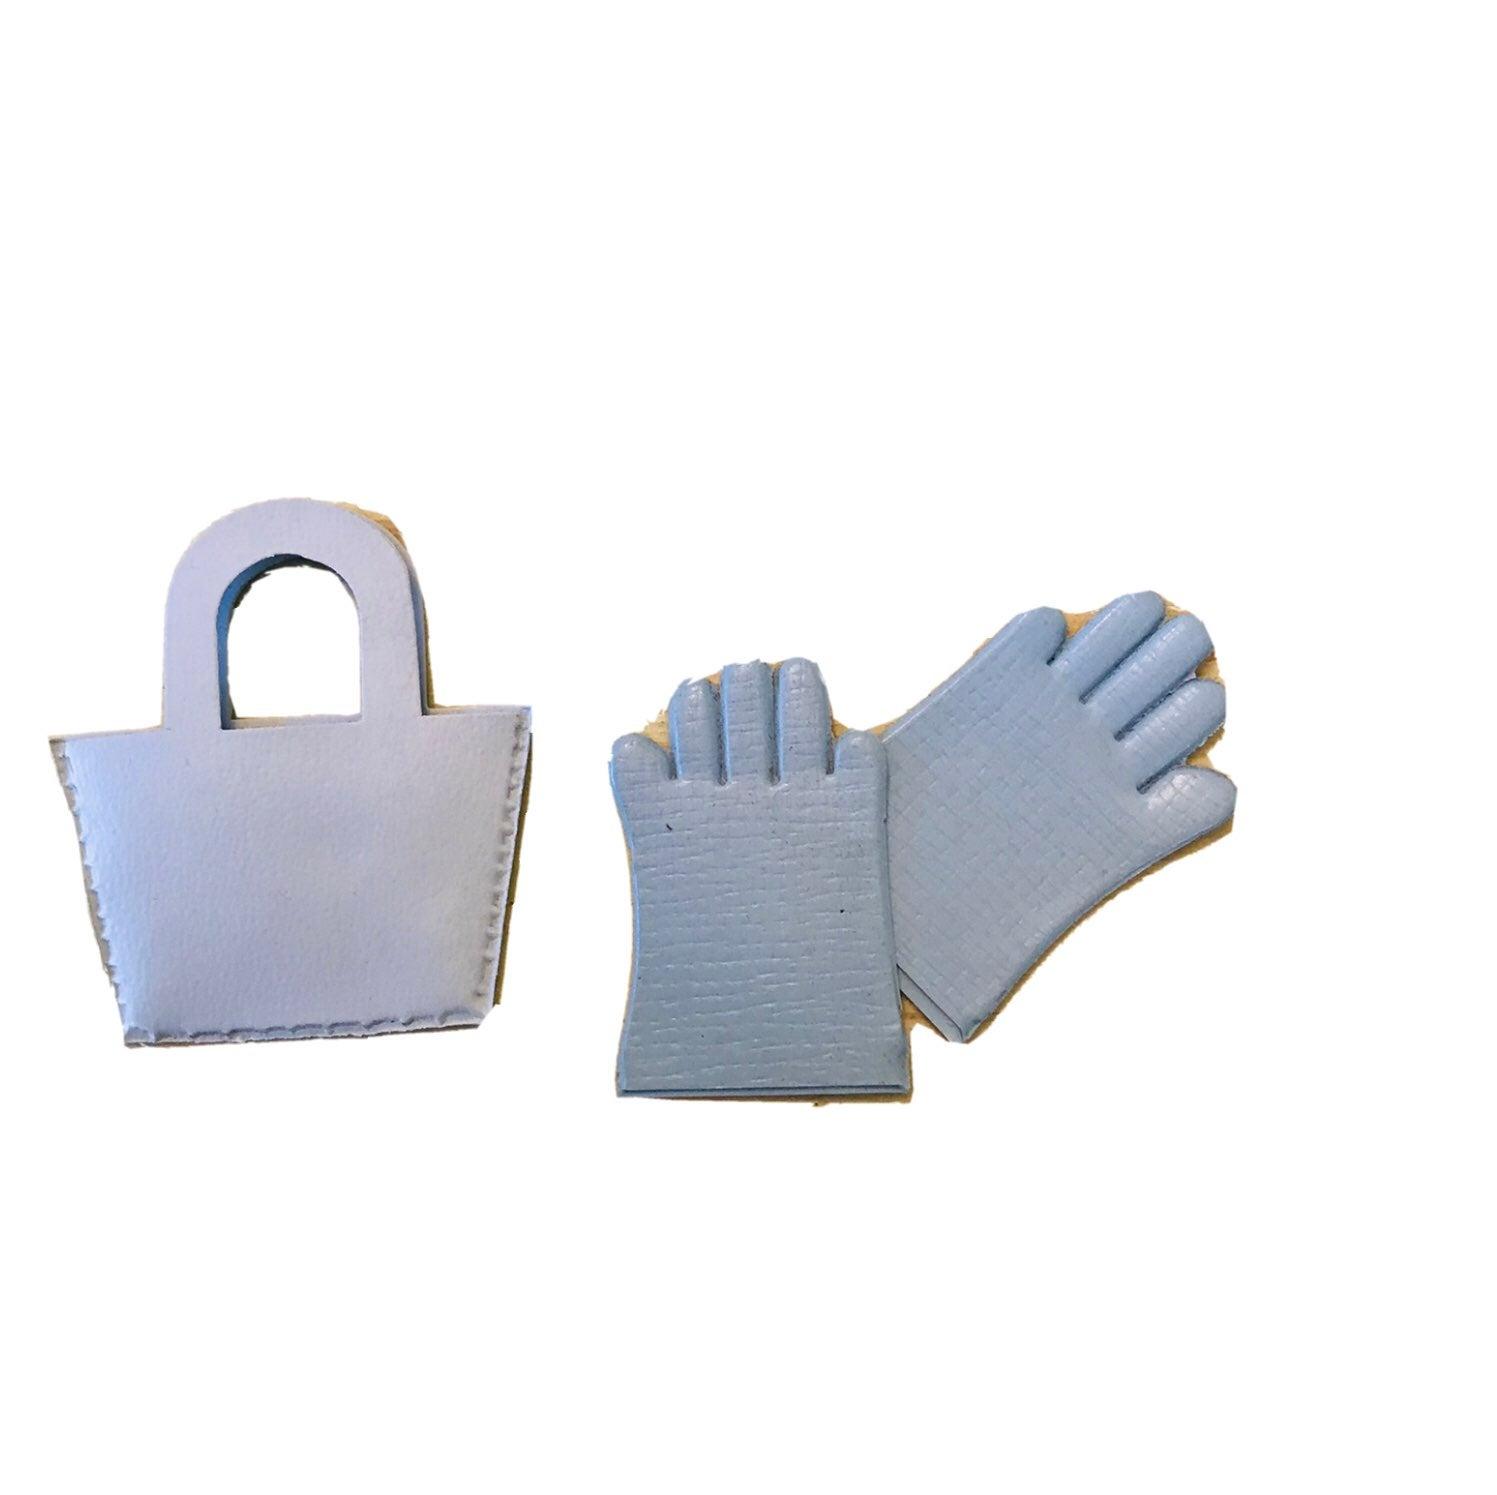 Vintage Doll Purse + Gloves Blue 1950s